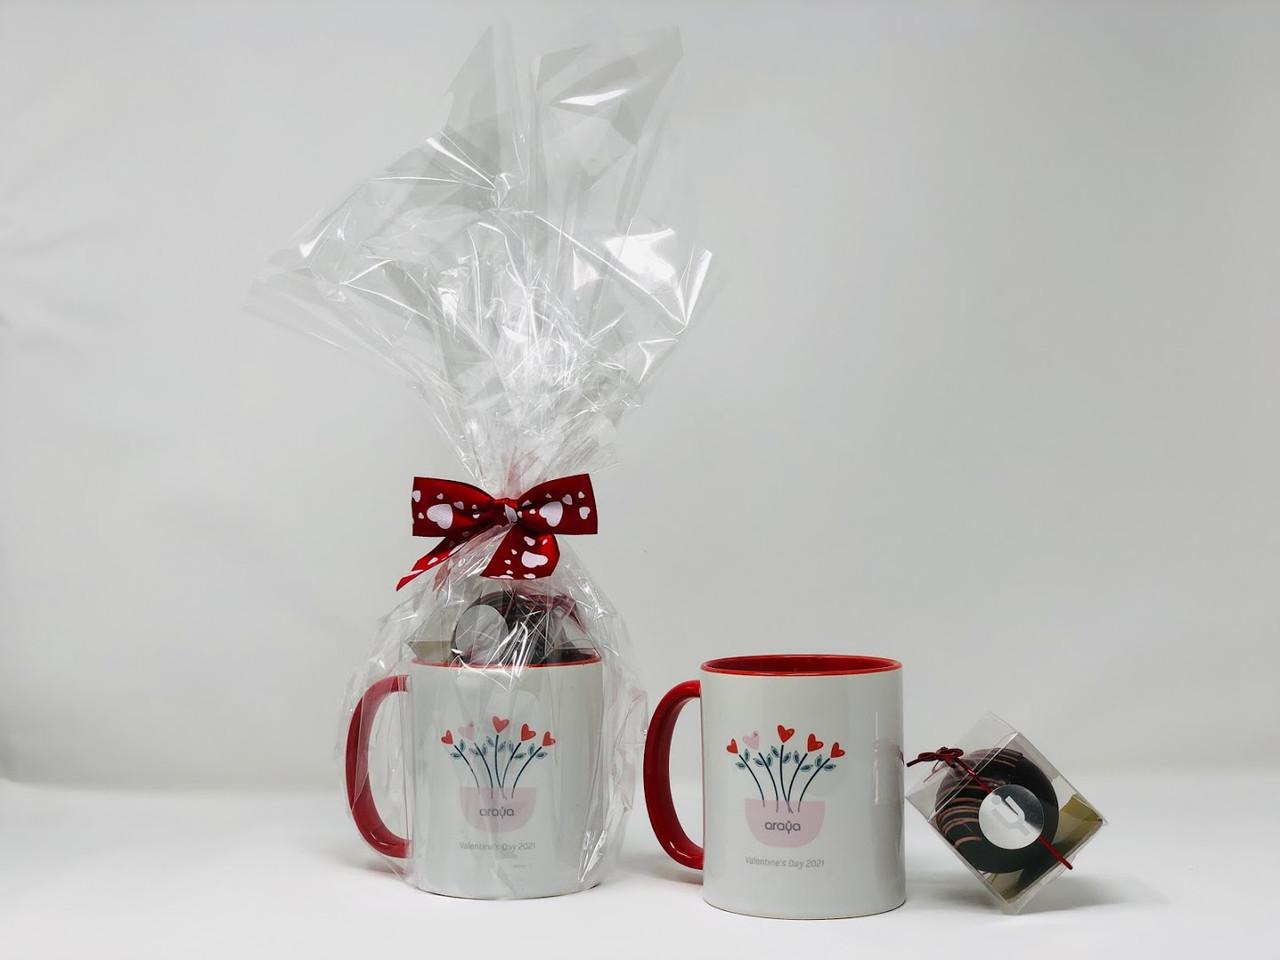 Valentine's Day mug with Chocobom